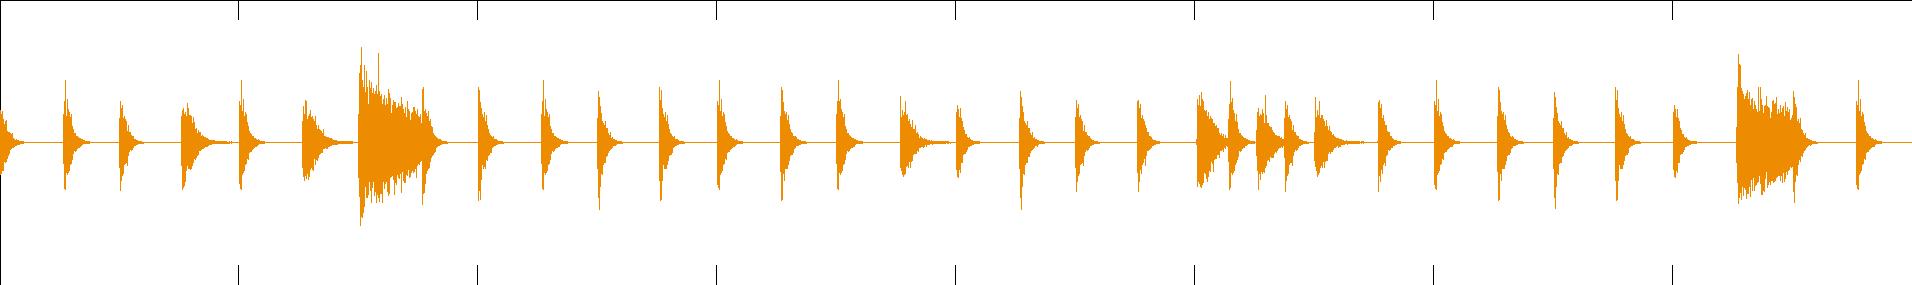 WaveDrum02_55_HH